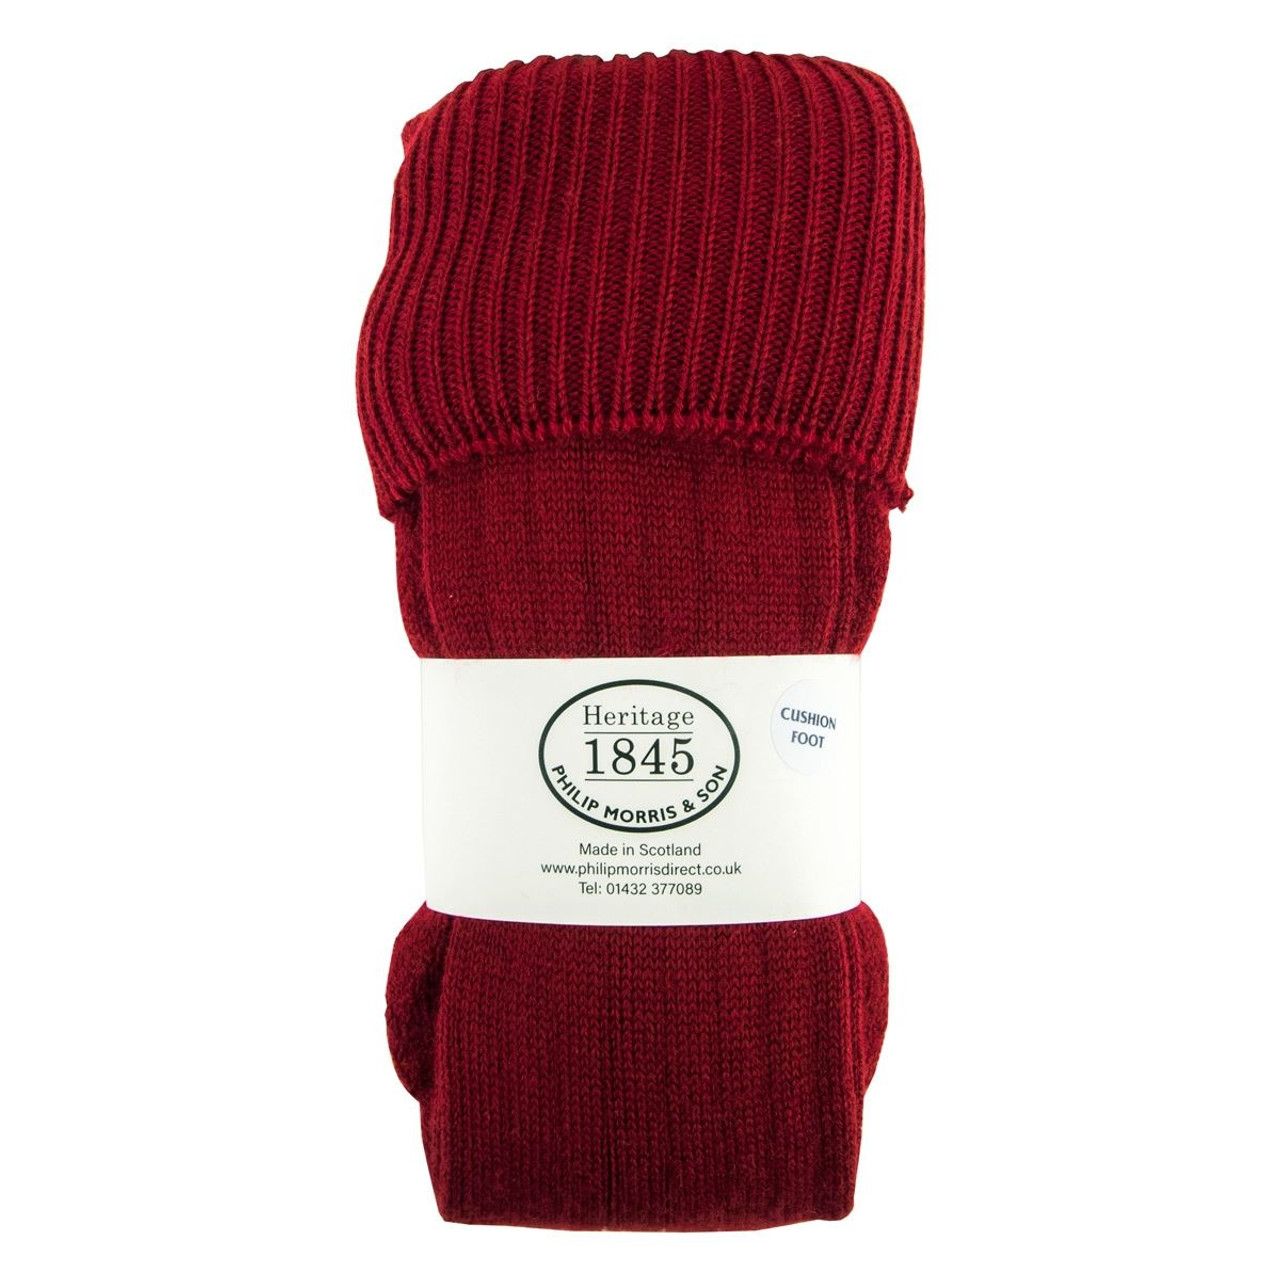 Heritage 1845 Scarba Classic Boot Sock